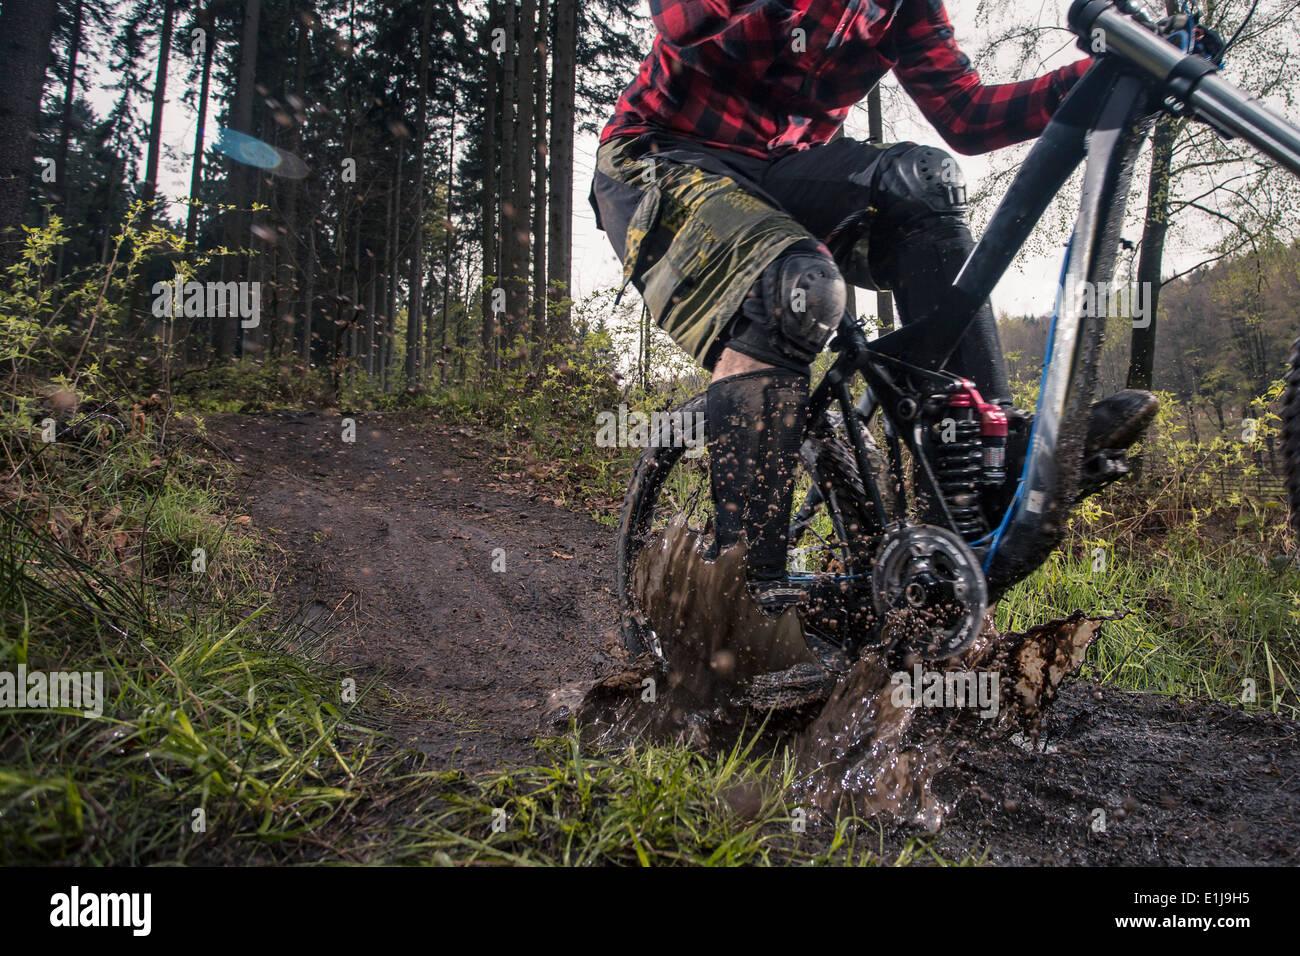 Germany, Lower Saxony, Deister, Bike Freeride in forest - Stock Image